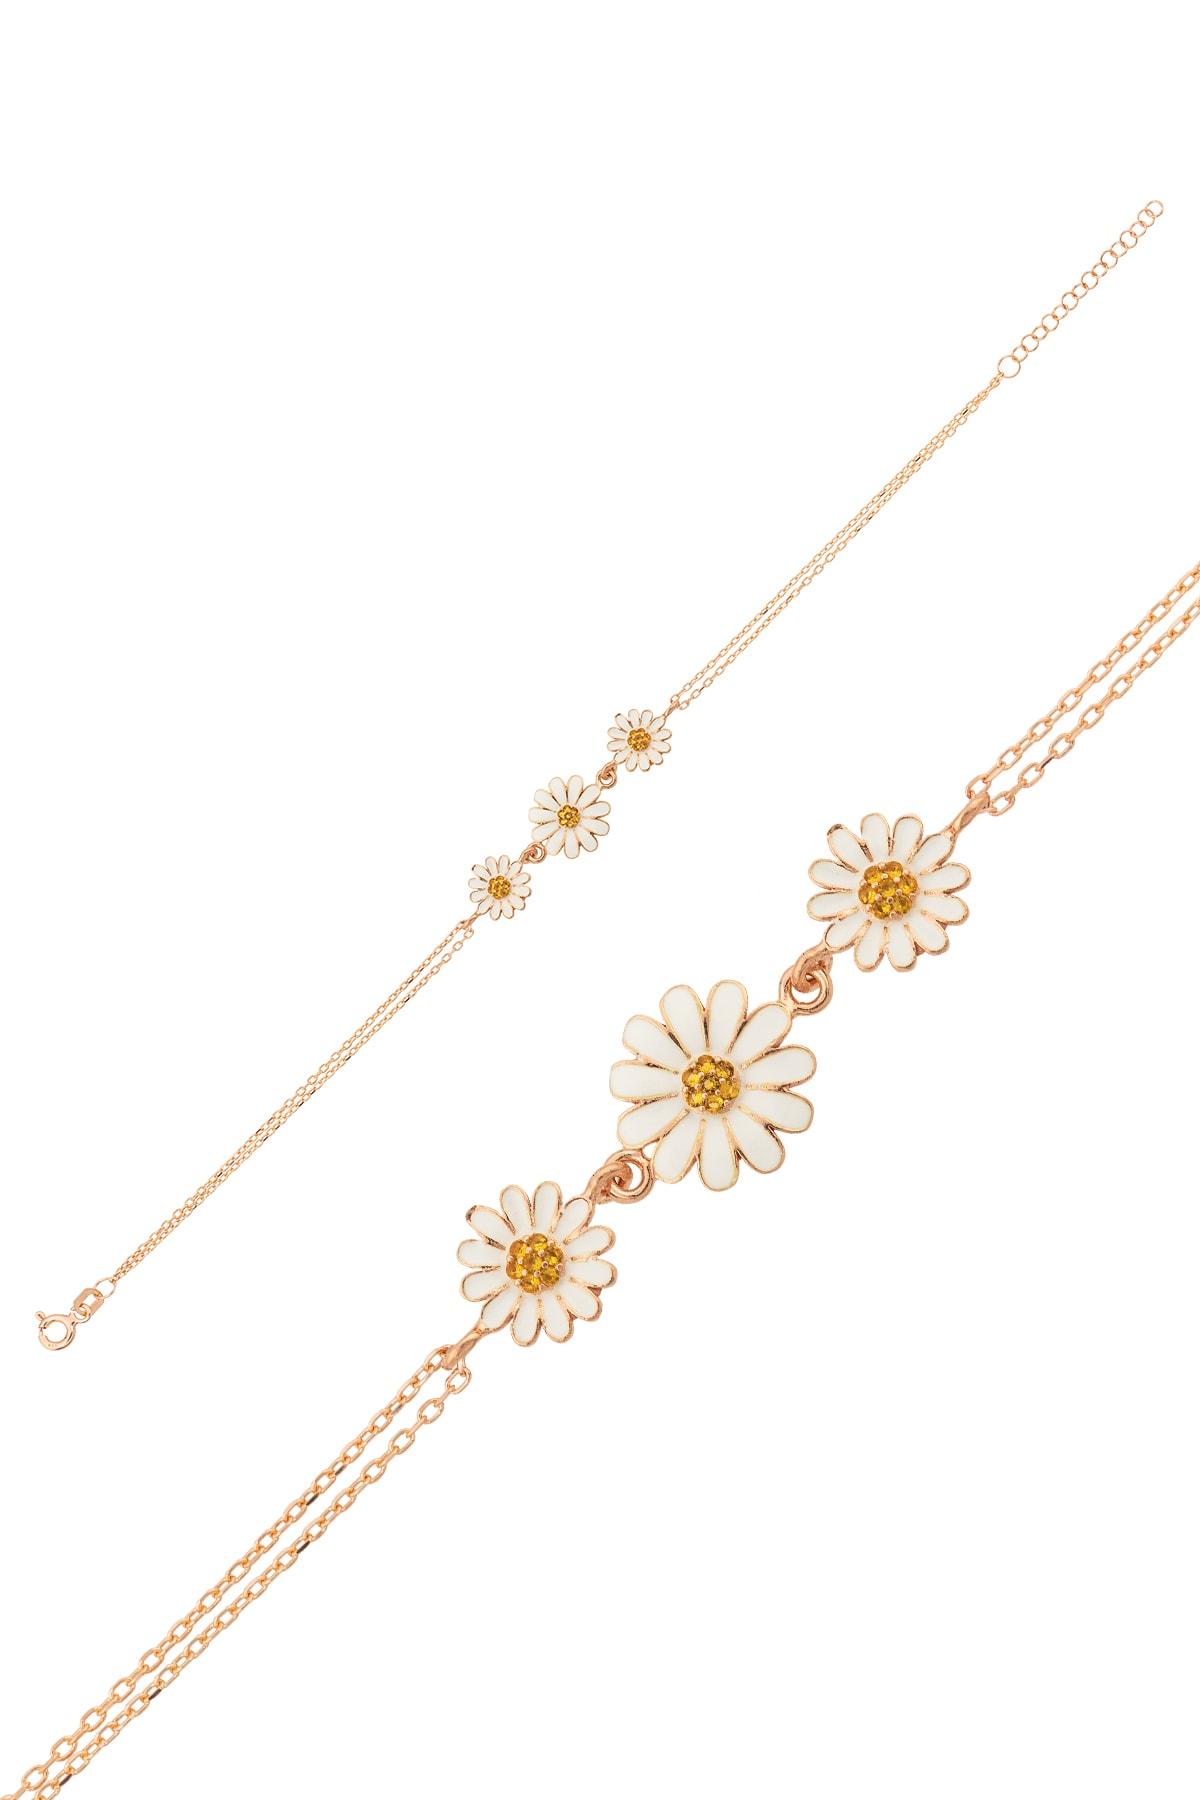 Papatya Silver Üç Papatya Süzme Bileklik - Sarı Nano Zirkon Taşlı Mineli Rose Altın Kaplama 925 Ayar Gümüş 2